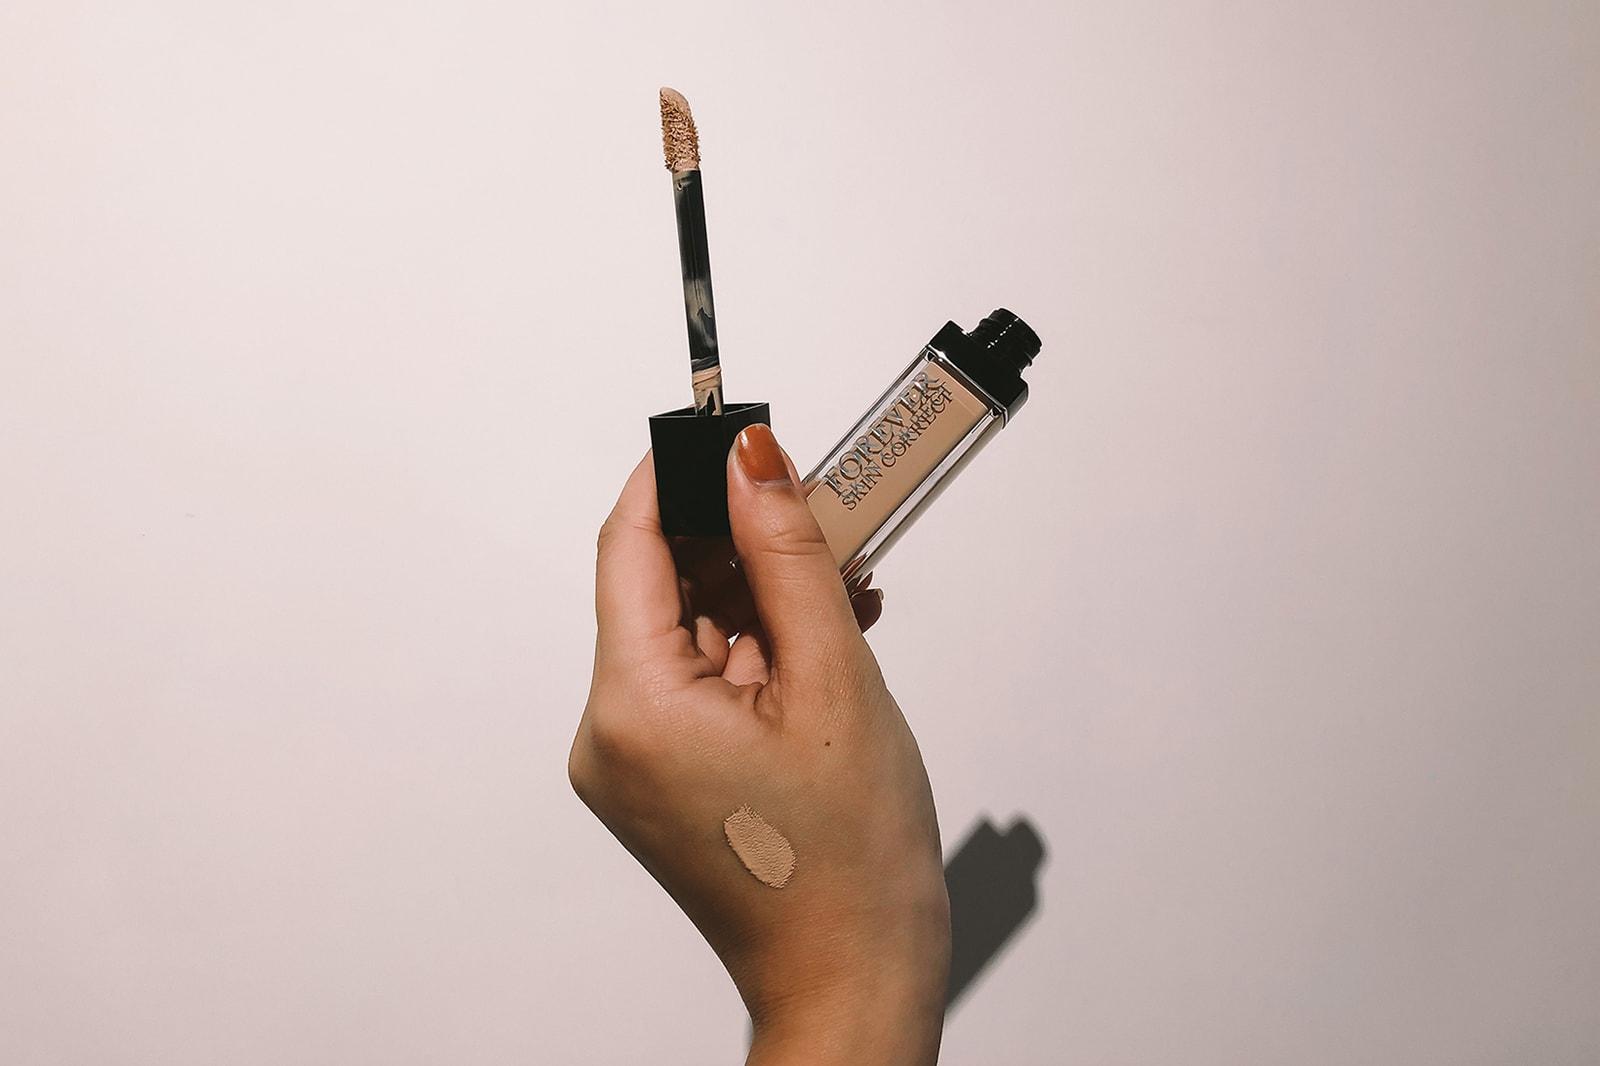 dior forever skin correct concealer beauty makeup product